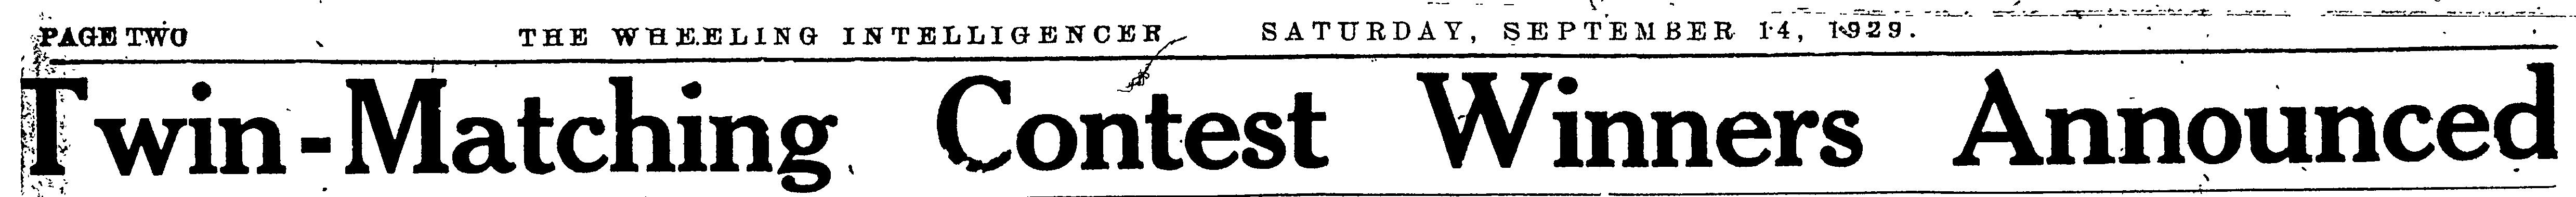 Twin-Matching Contest Headline, 1929